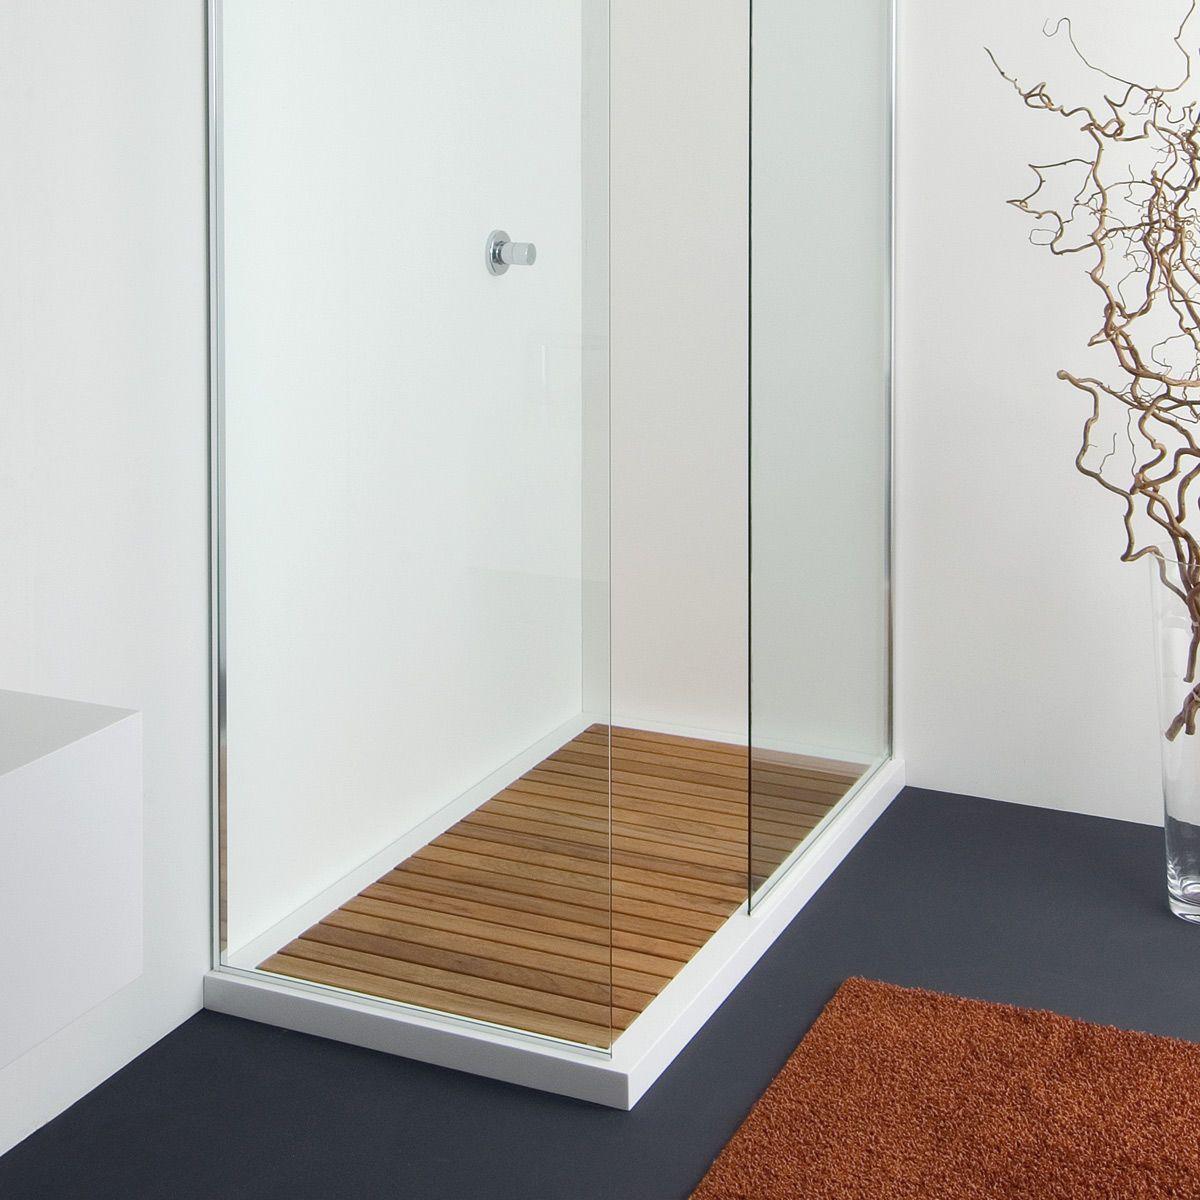 Teak Shower Floor?? Planit Doga Shower Tray: Shower Model Doga 1 In Corian  ®, Removable Teak Slats. Drain Hole Ø 90 Mm. Possible Installation Floor.